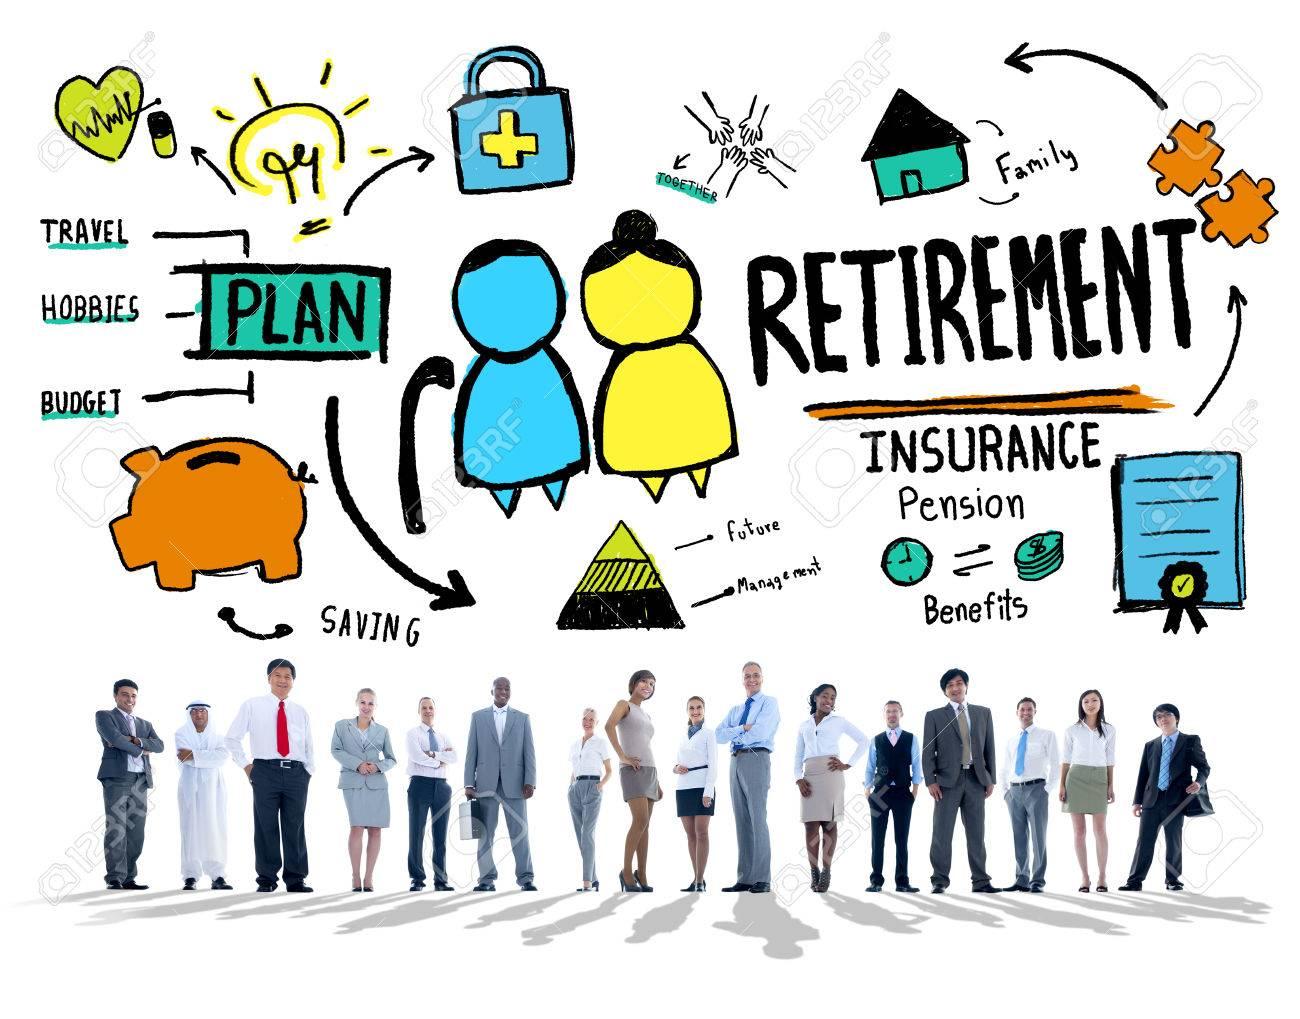 Employee Peion | Business People Employee Retirement Vision Aspiration Career Stock